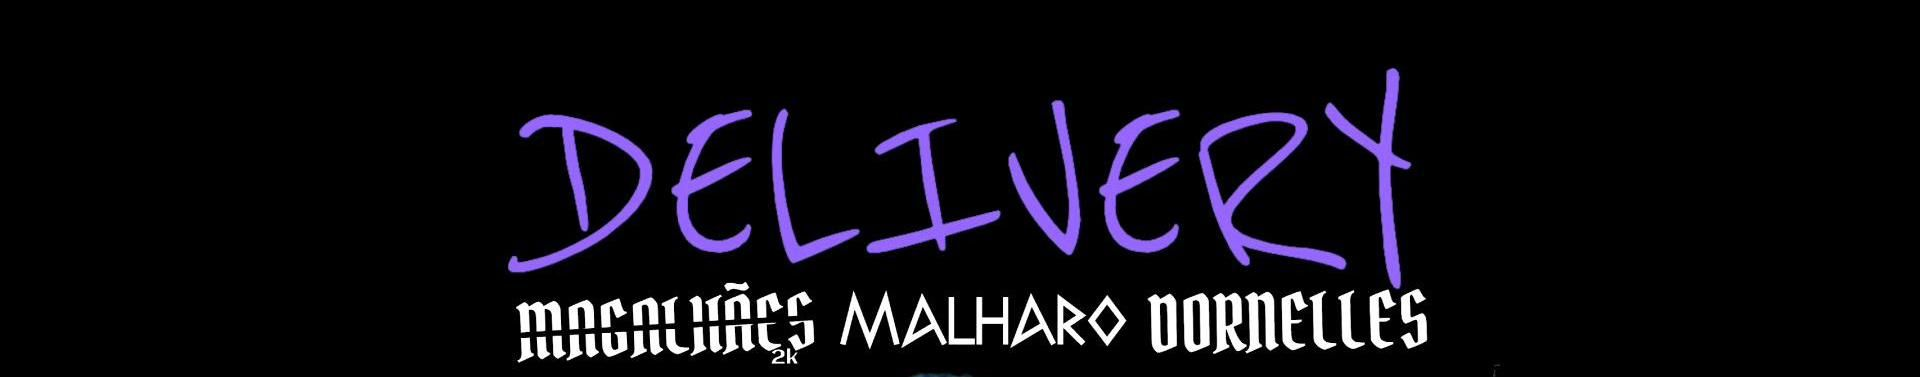 Imagem de capa de Malharo